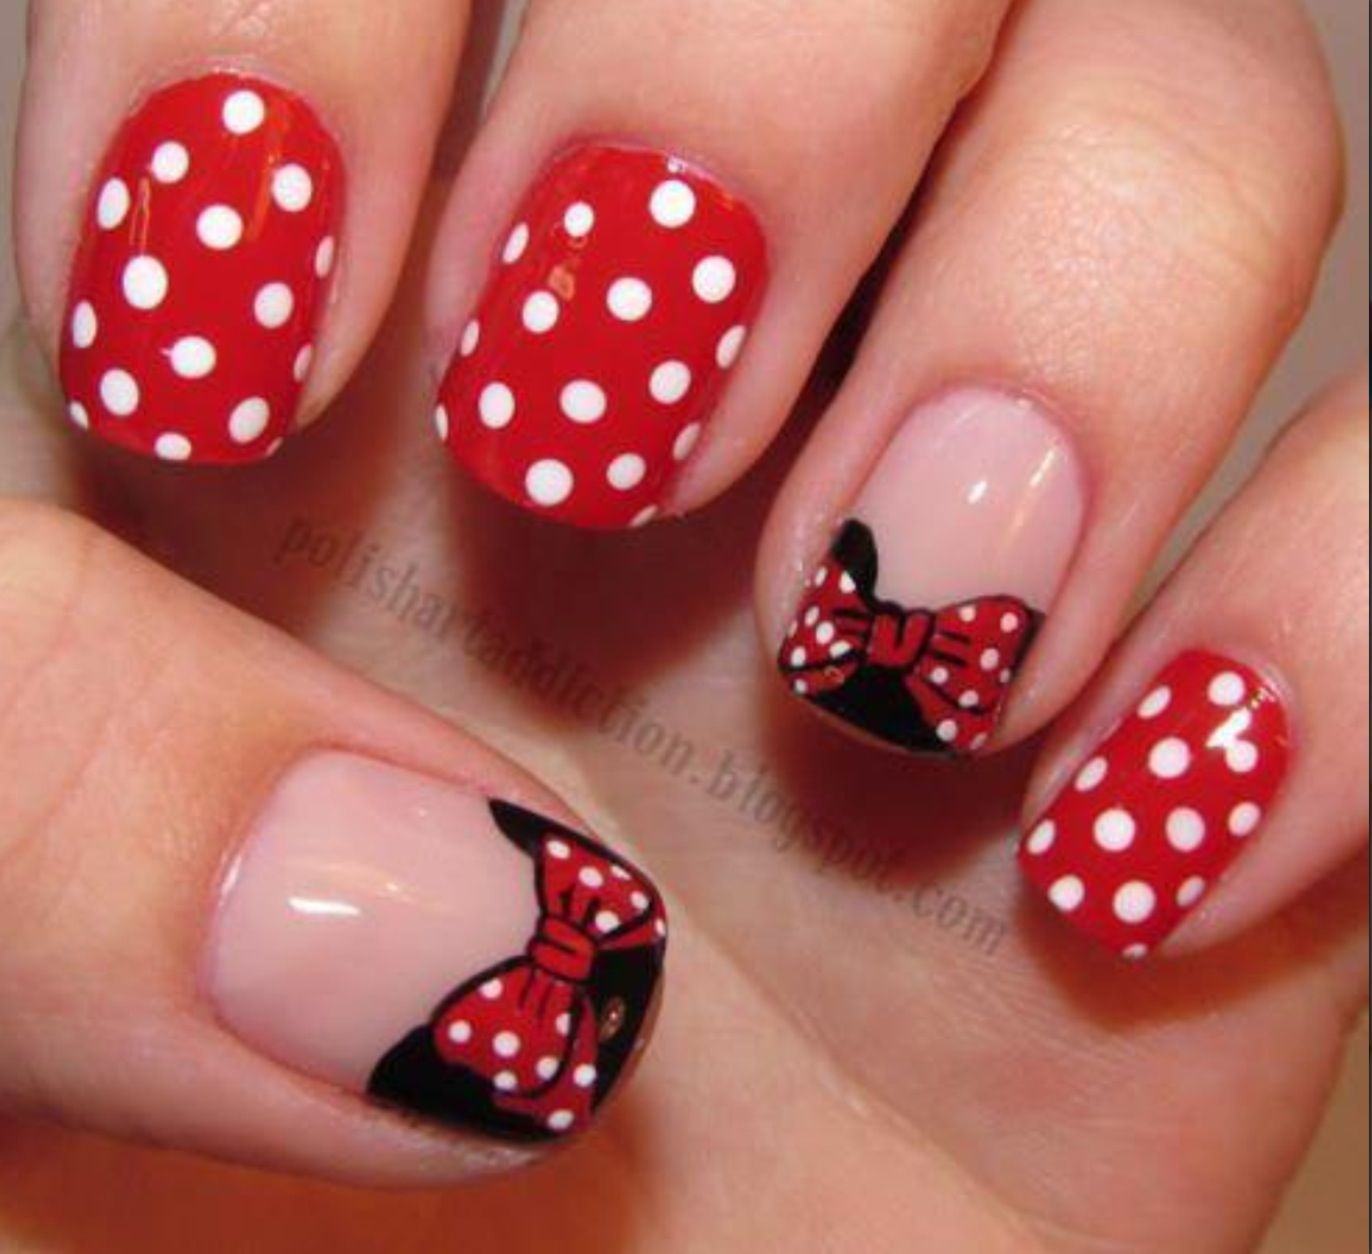 Minnie Mouse nails!   Nails   Pinterest   Minnie mouse nails, Minnie ...